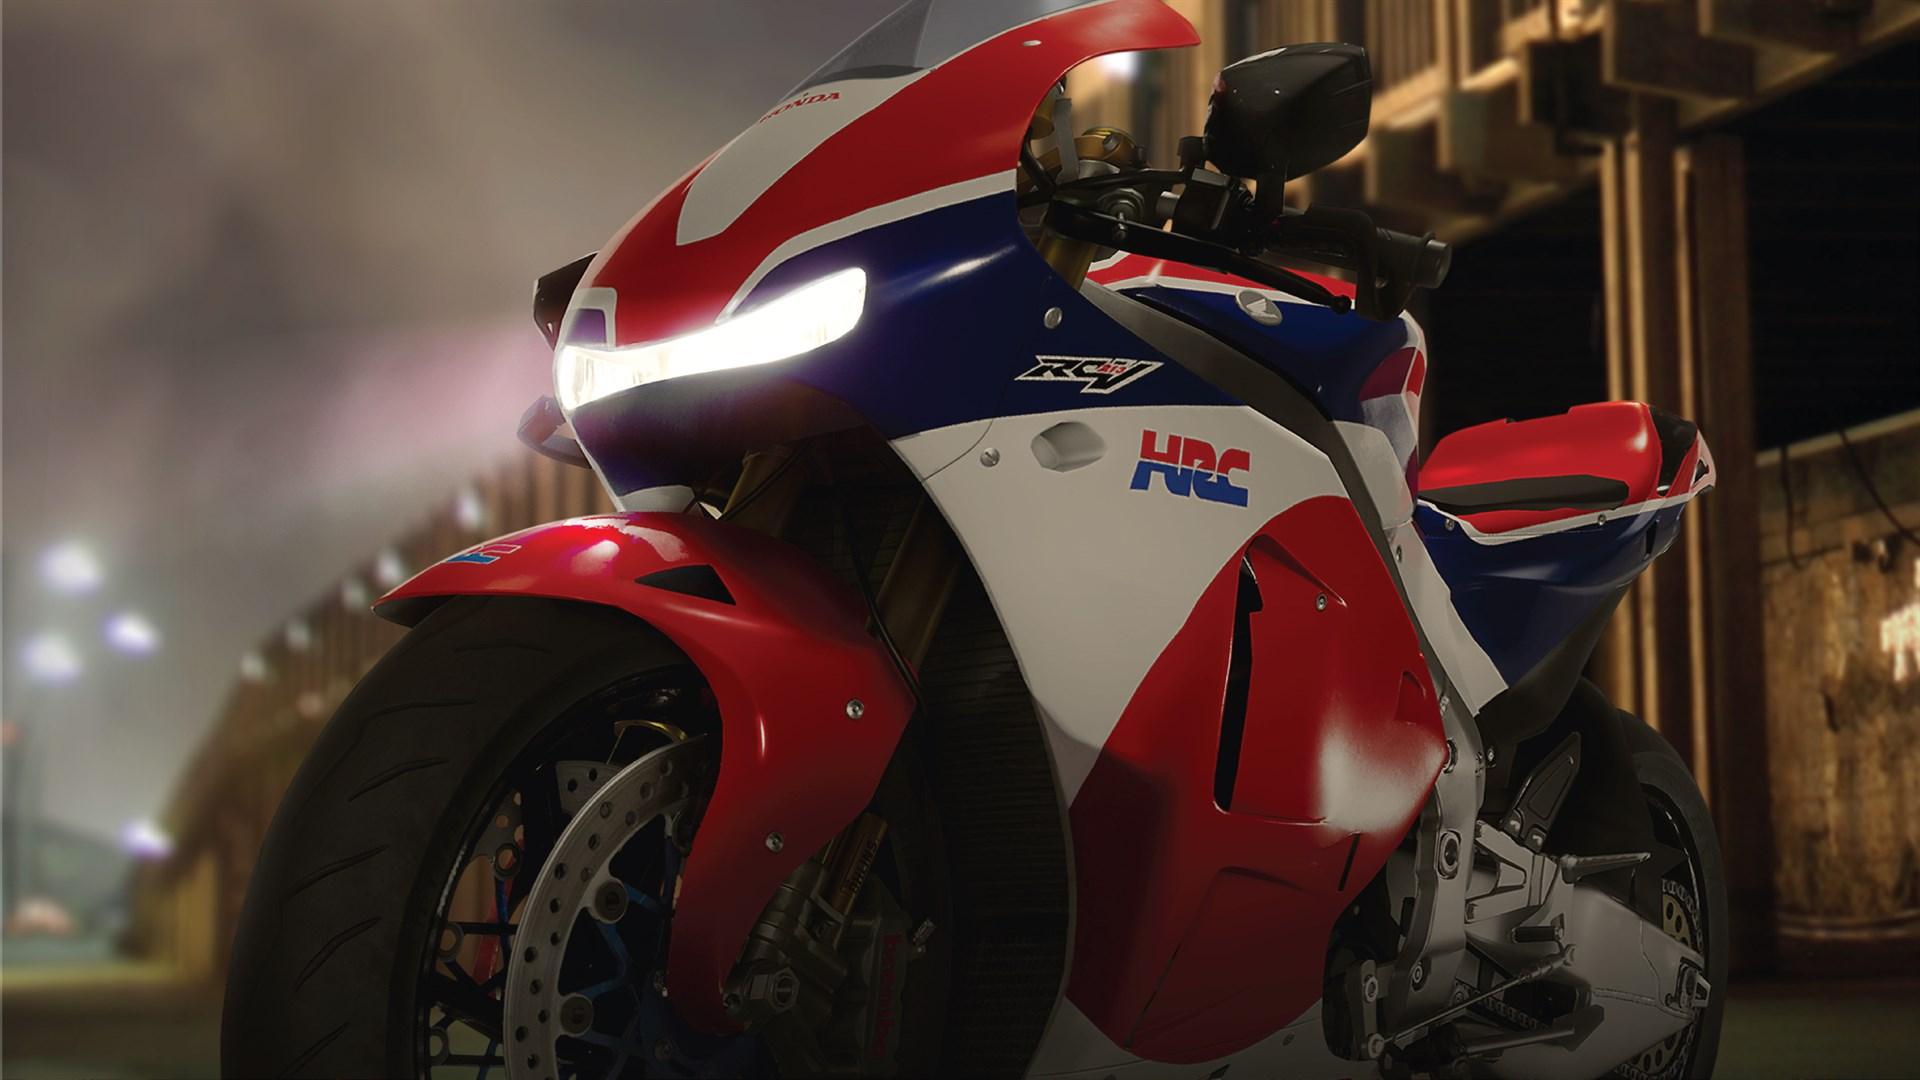 RIDE 3 - Japan Pack